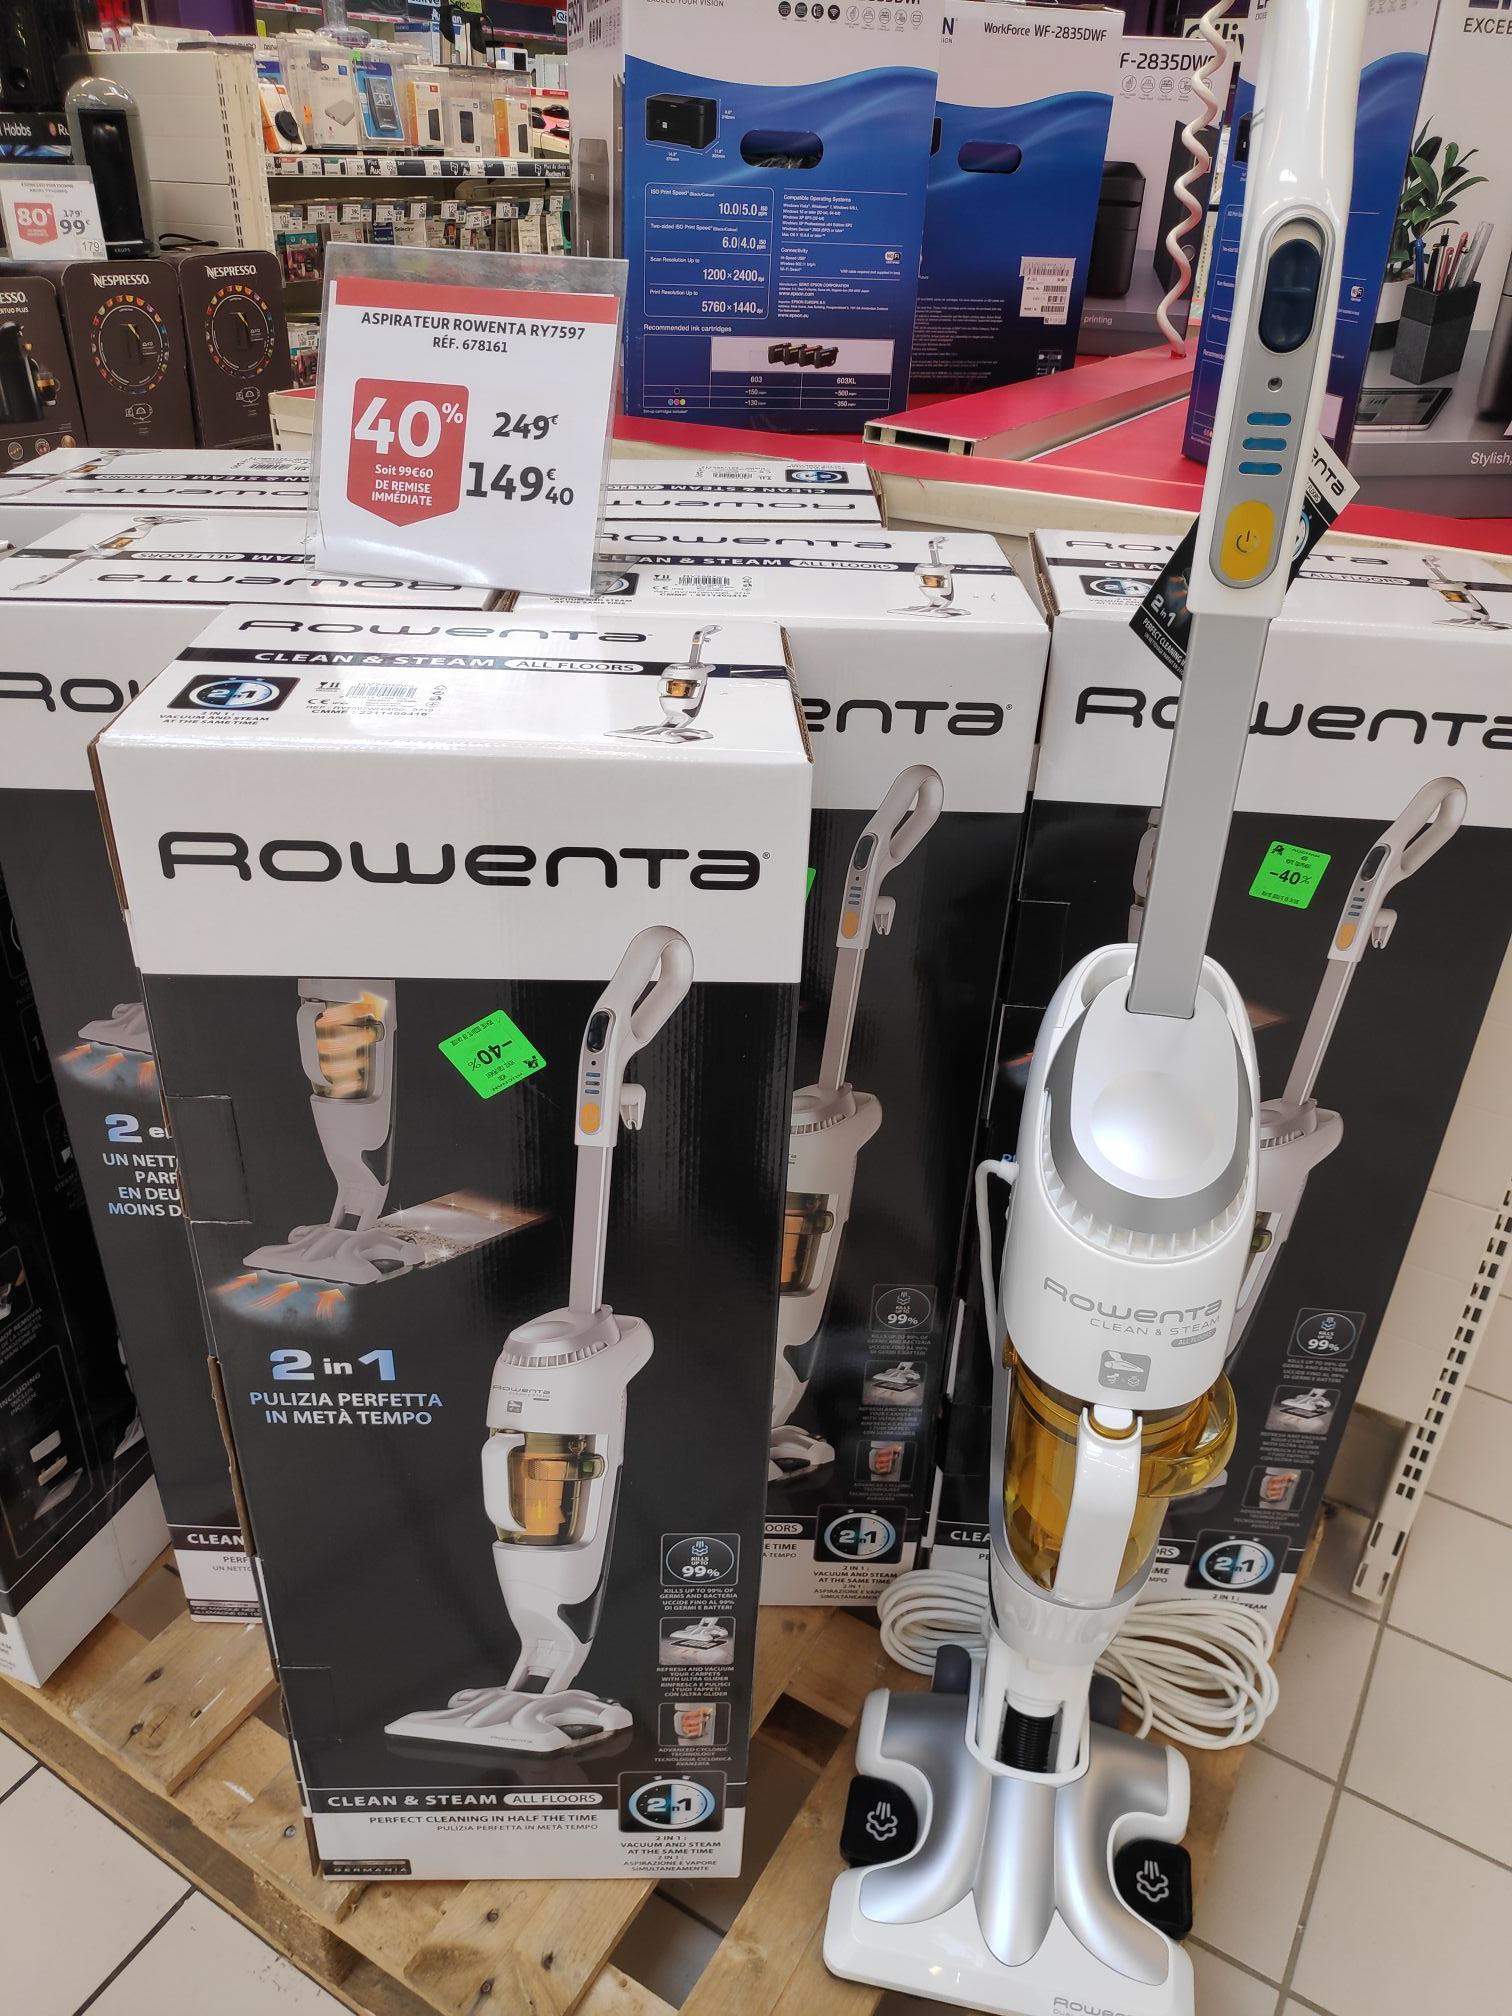 Aspirateur Rowenta Clean and Steam RY7597 - Méru (60)